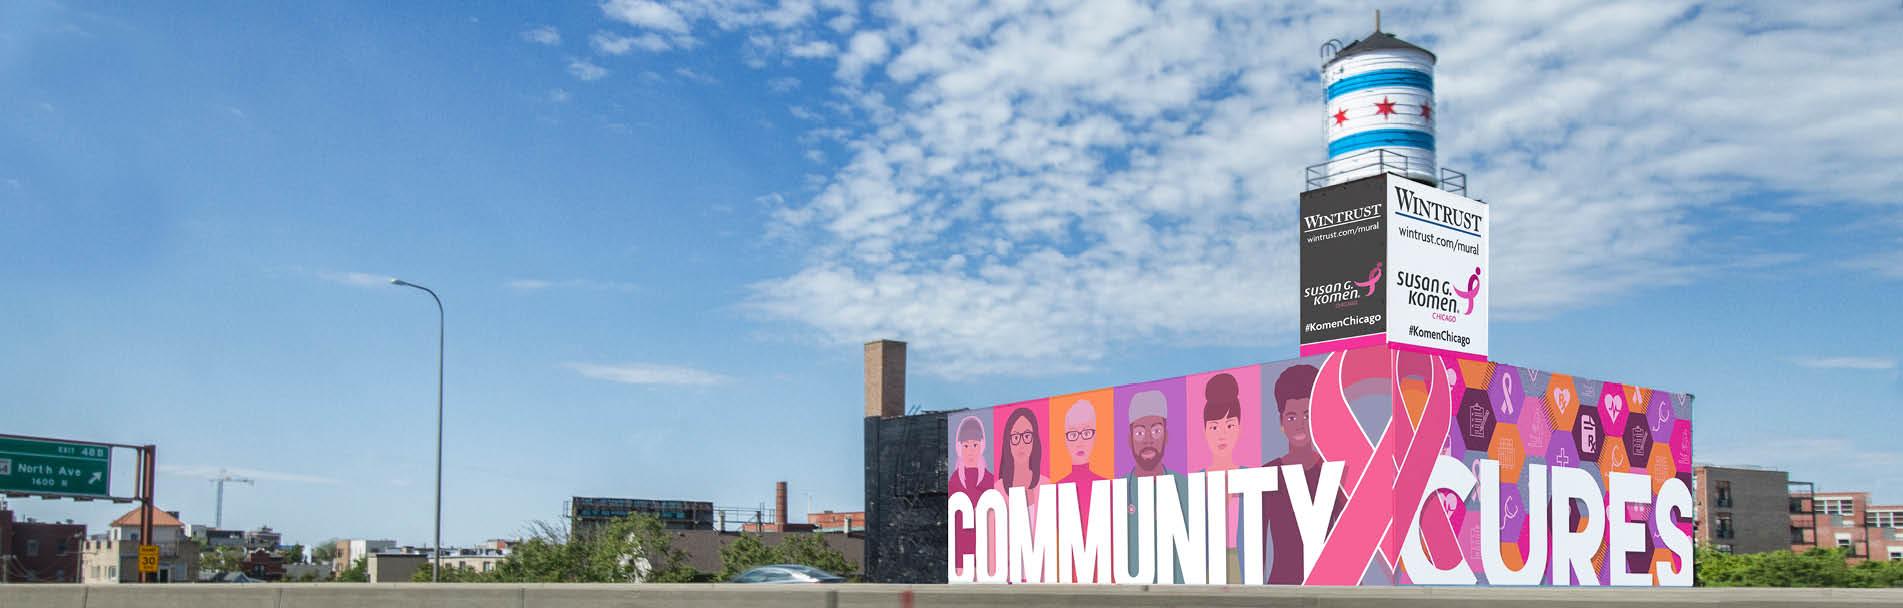 The Mural Building: Susan G. Komen Chicago